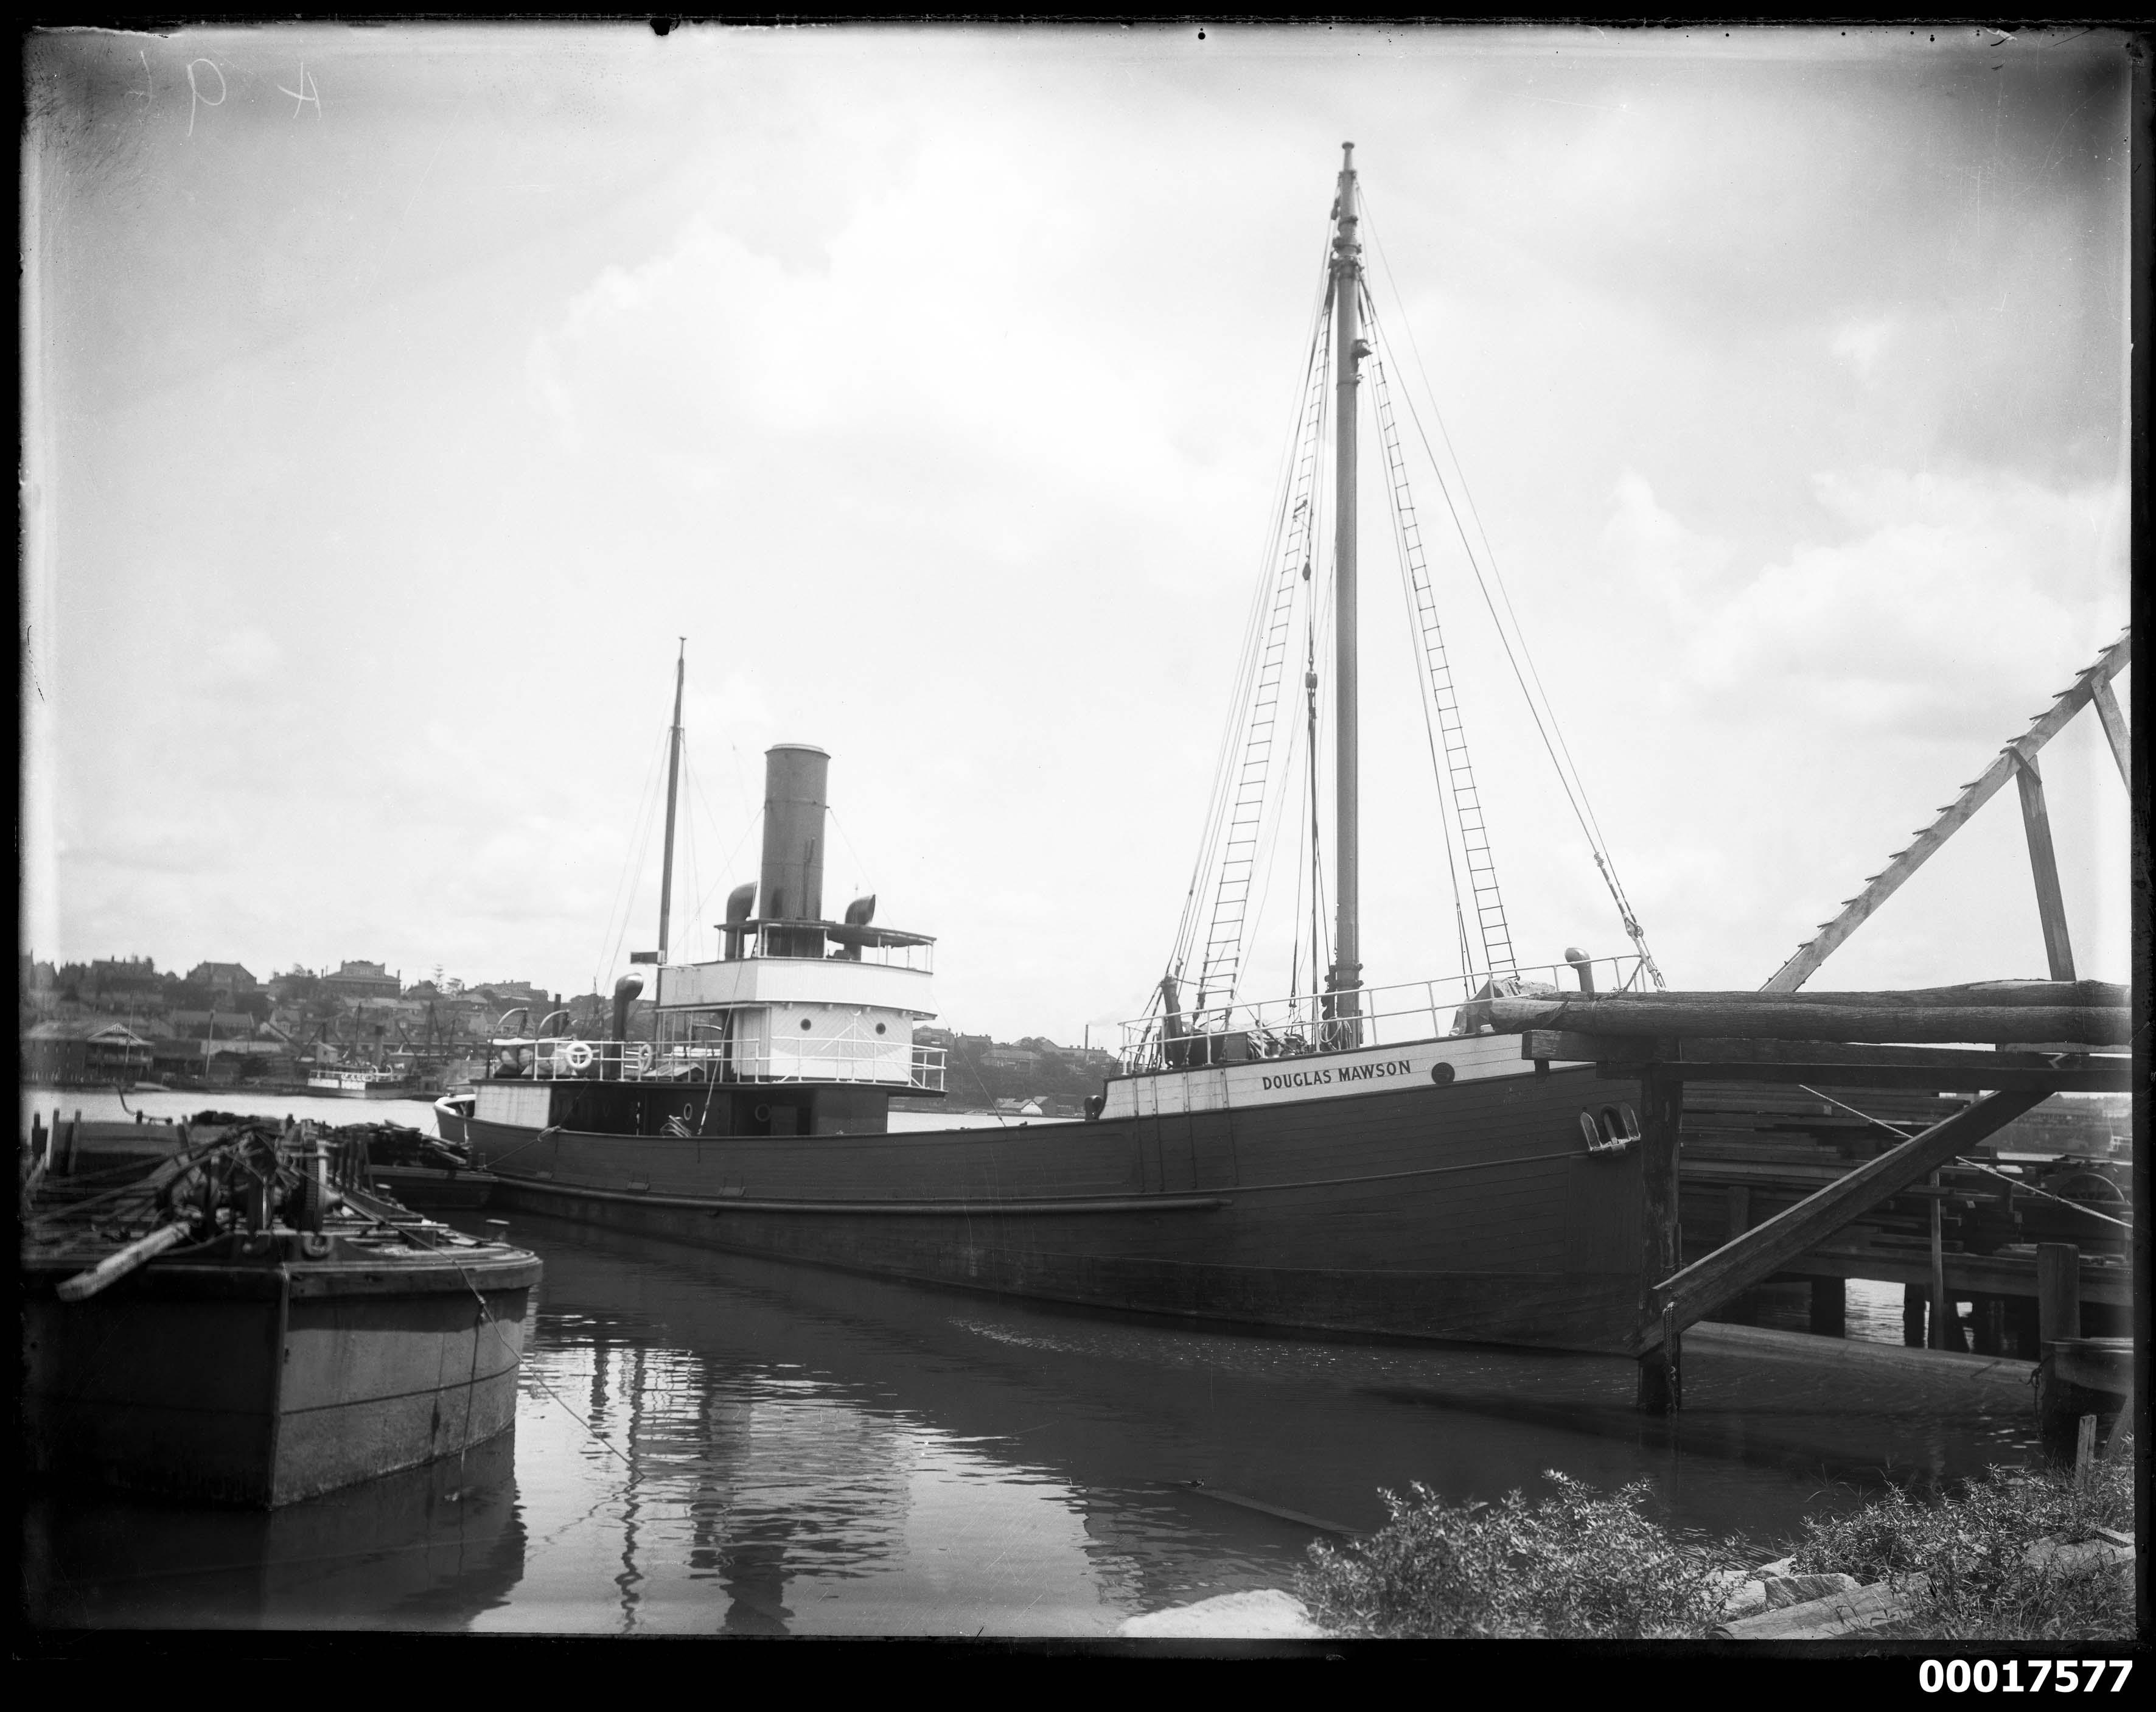 SS DOUGLAS MAWSON, 1914-1923